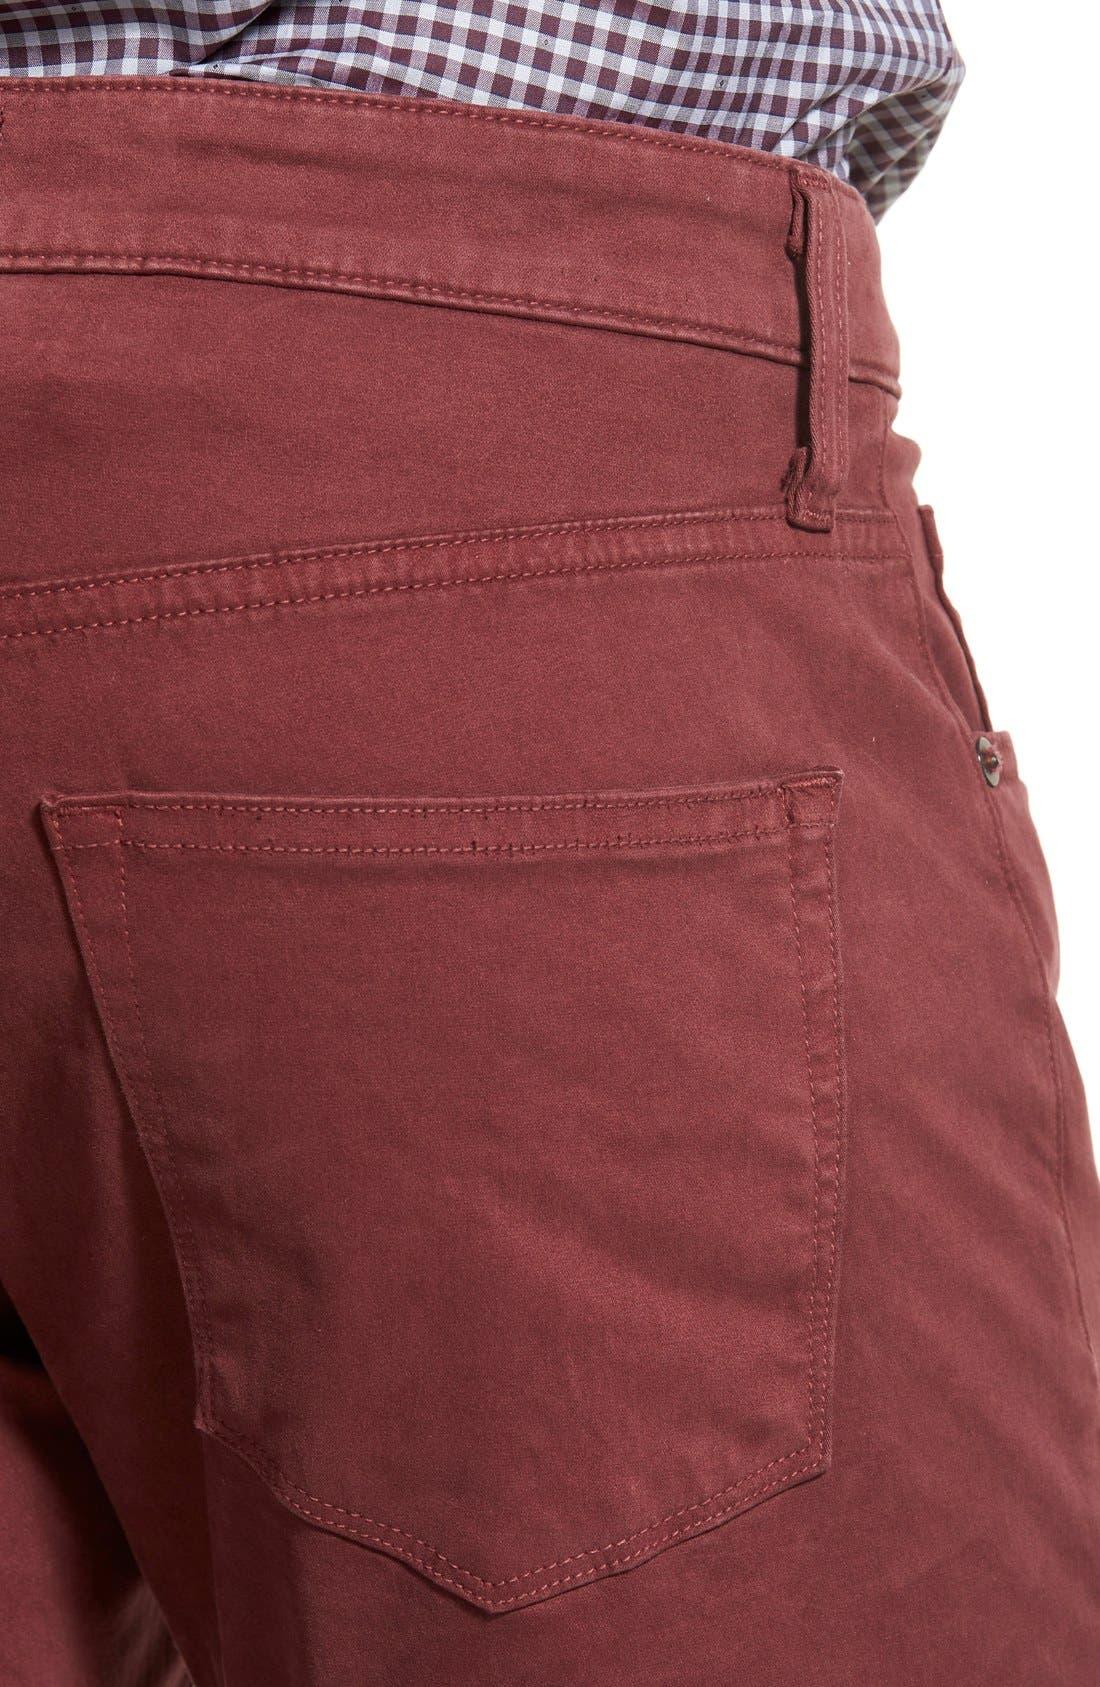 'Kane' Slim Fit Cotton Twill Pants,                             Alternate thumbnail 39, color,